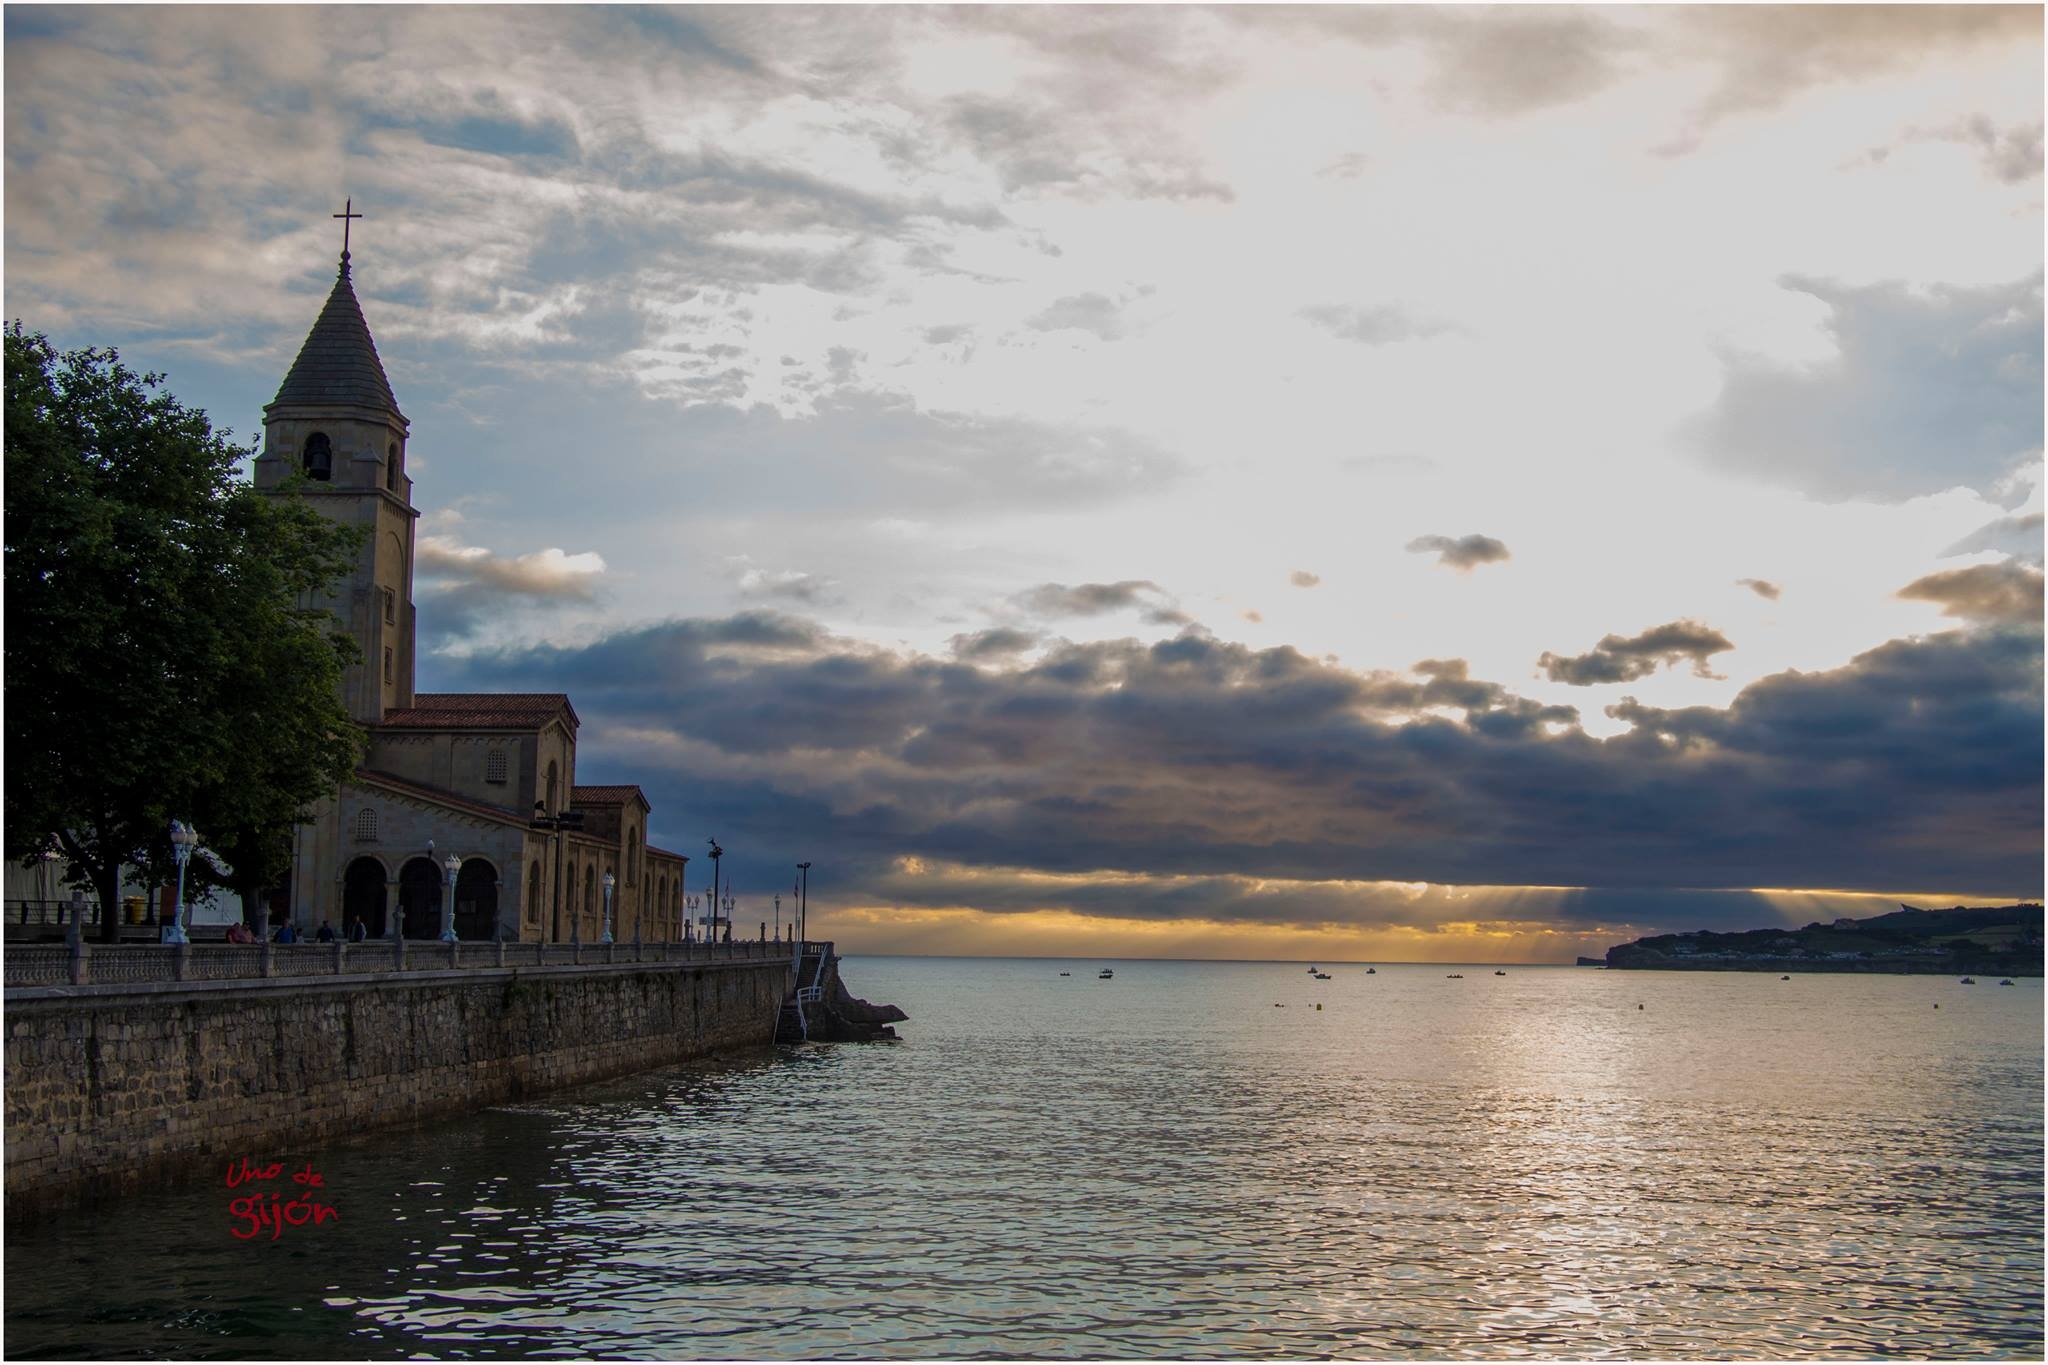 ciudades del Norte de España, Gijón Fotografía por Uno de Gijón